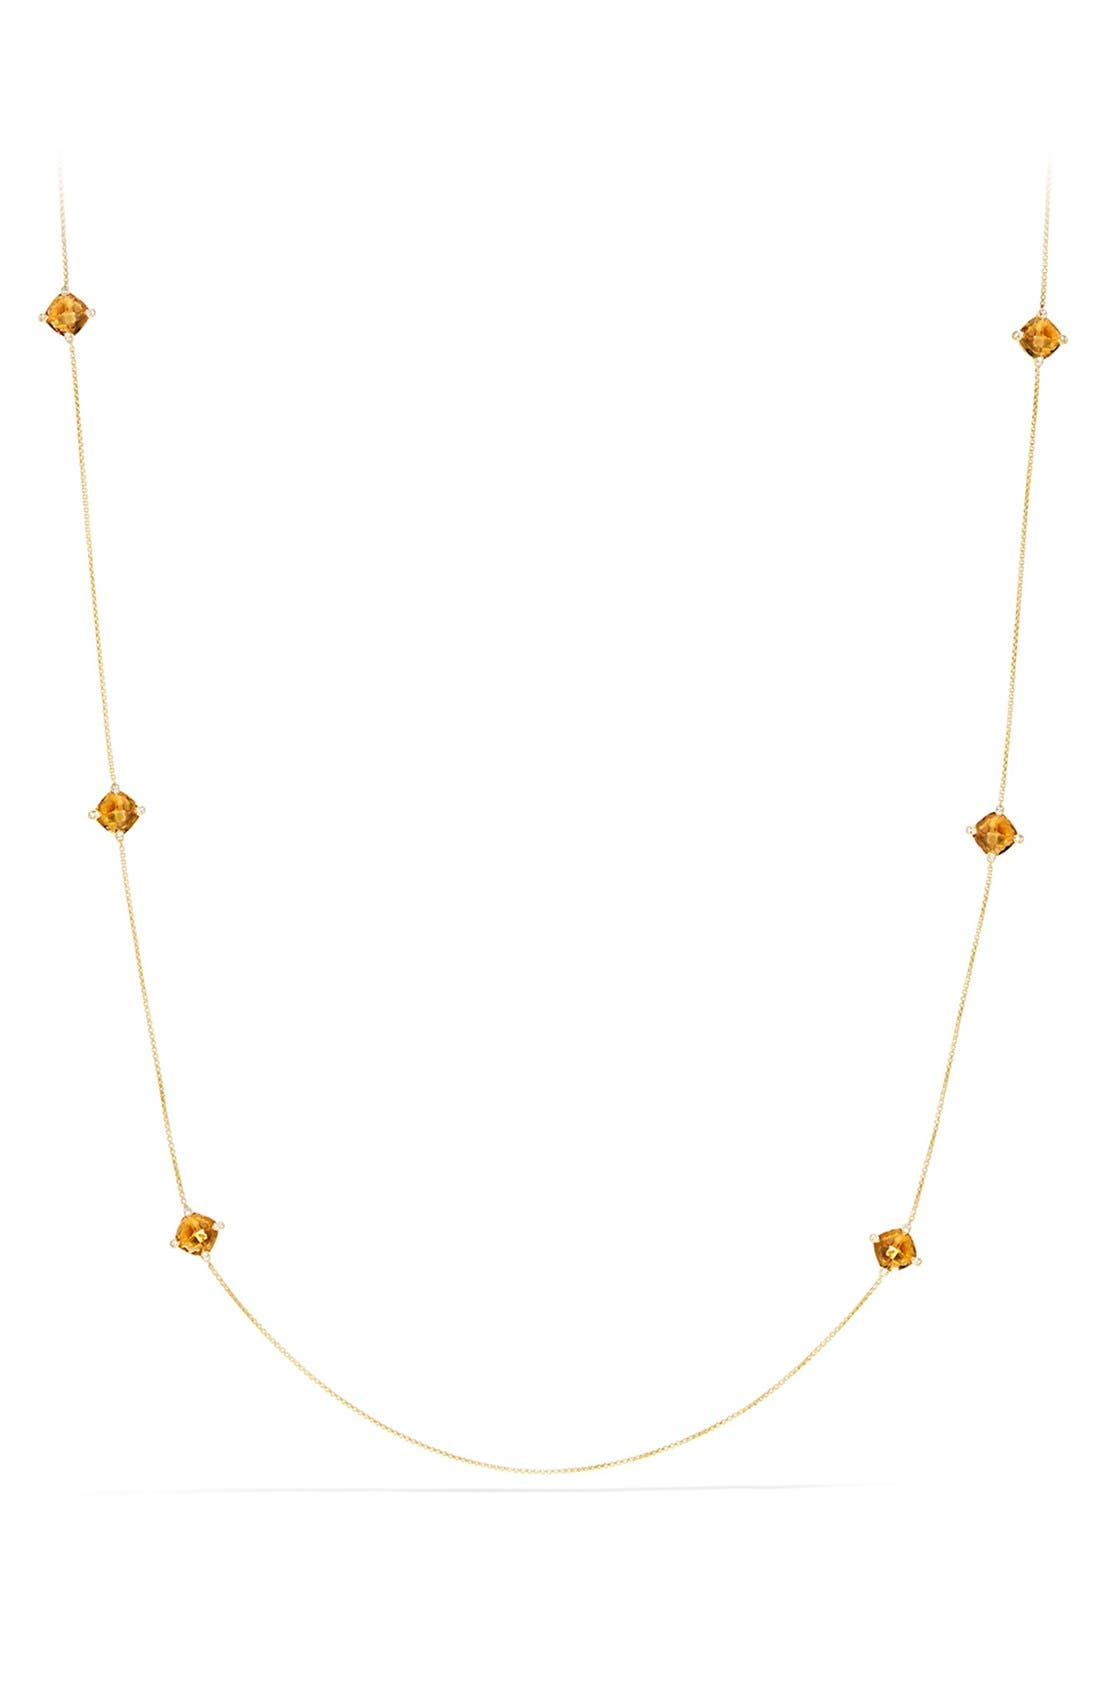 'Châtelaine' Long Semiprecious Stone Necklace with Diamonds,                             Main thumbnail 1, color,                             CITRINE